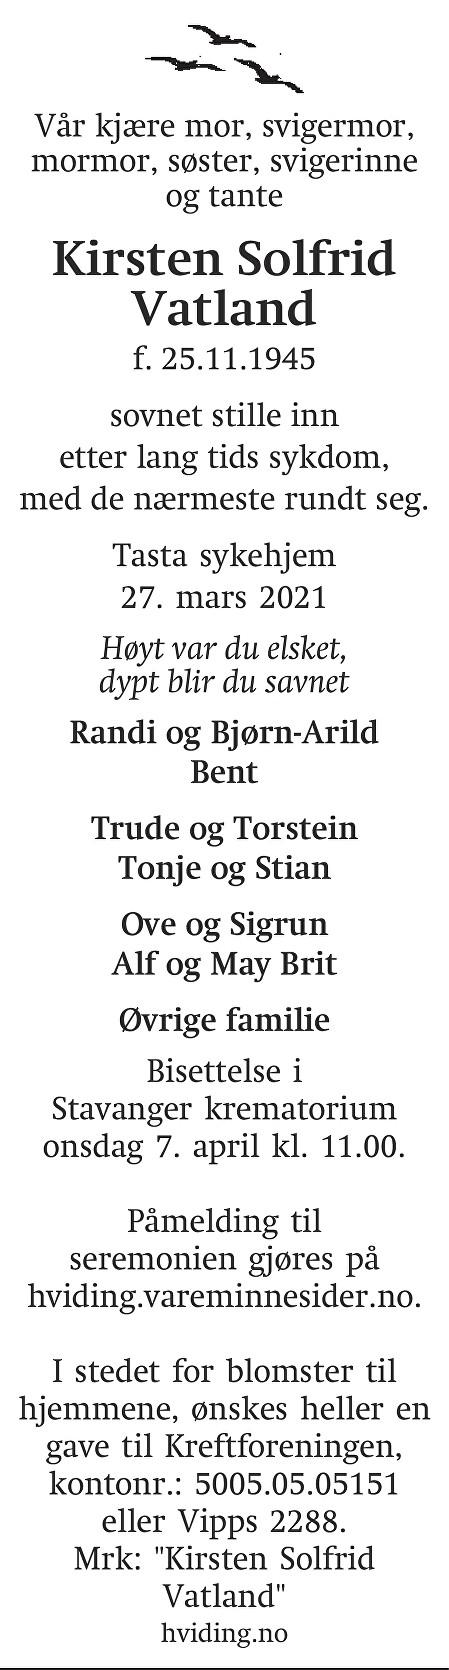 Kirsten Solfrid Vatland Dødsannonse